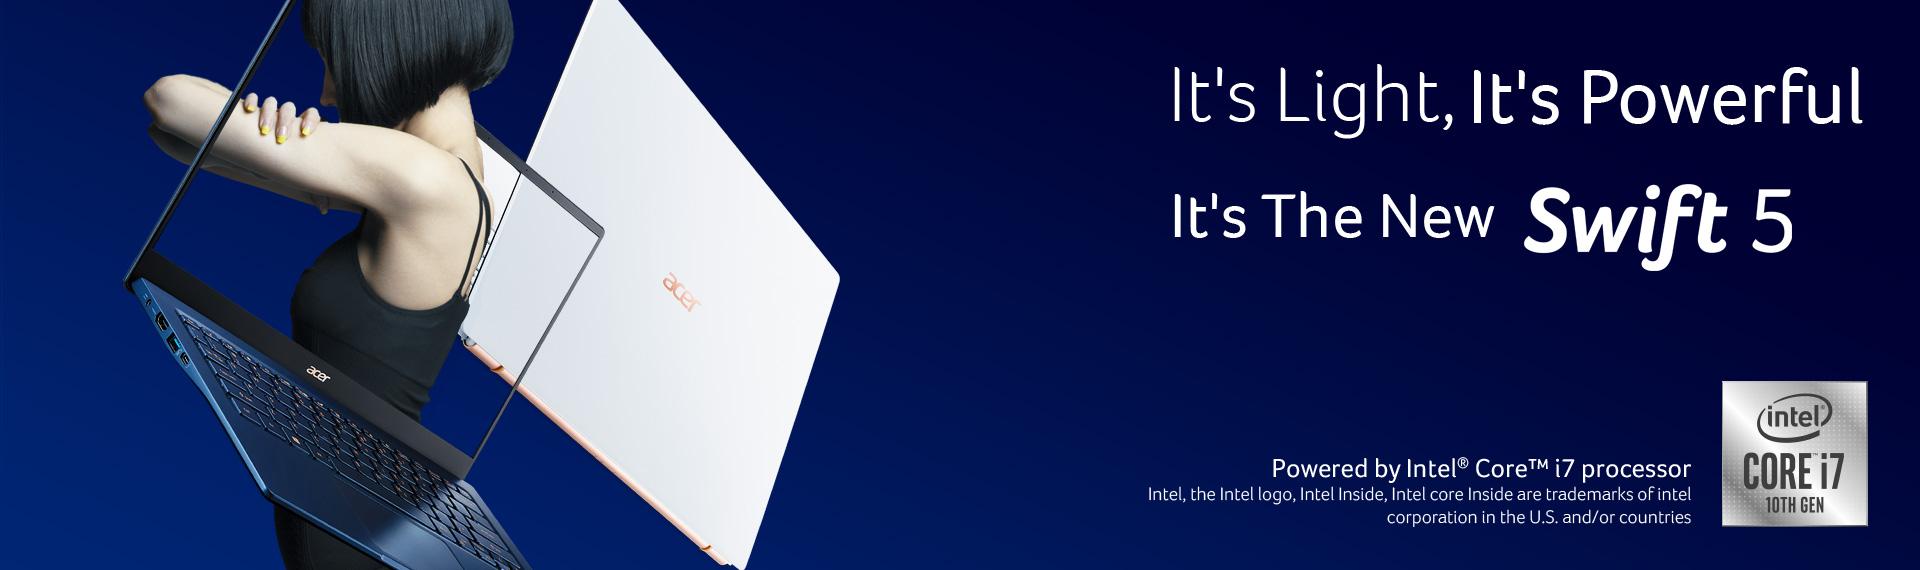 Acer Swift 5 dan Swift 3, Berbalut Tipis dan Stylish Dengan Performa Intel Gen 10